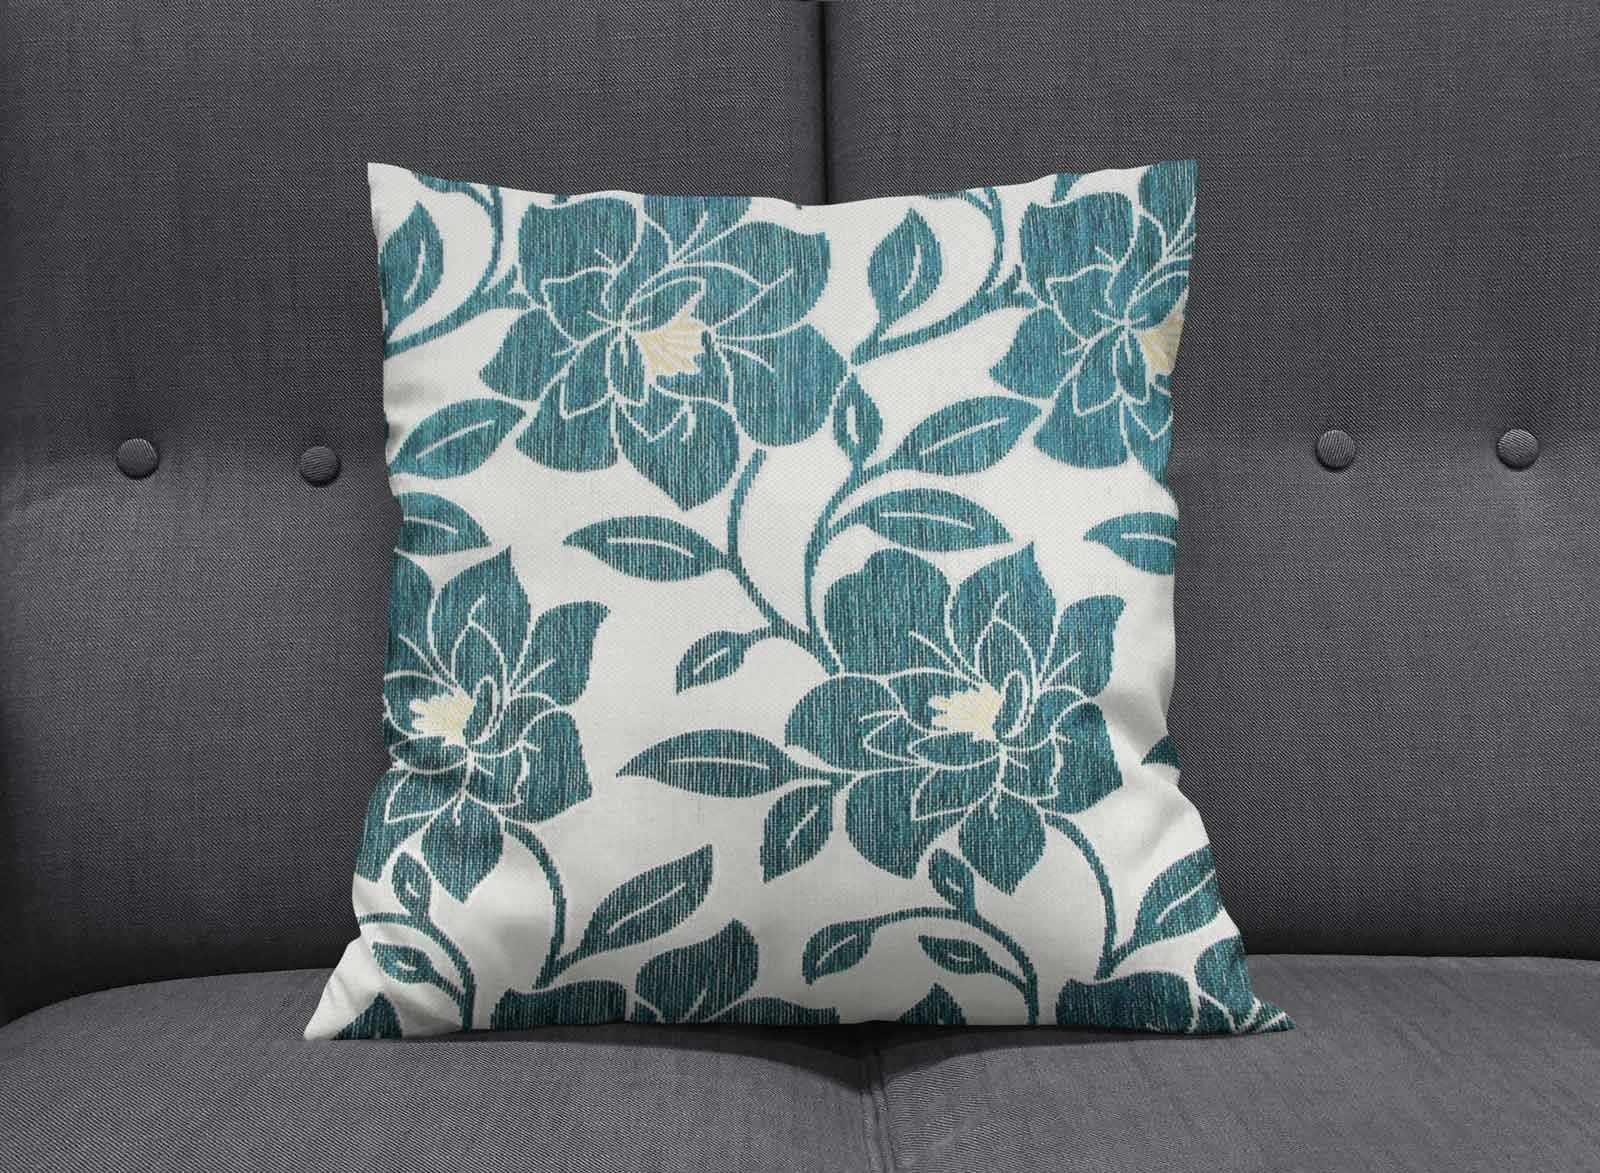 Teal-Blue-Duck-Egg-Cushion-Covers-18-034-x18-034-45cm-x-45cm-Luxury-Cover thumbnail 44